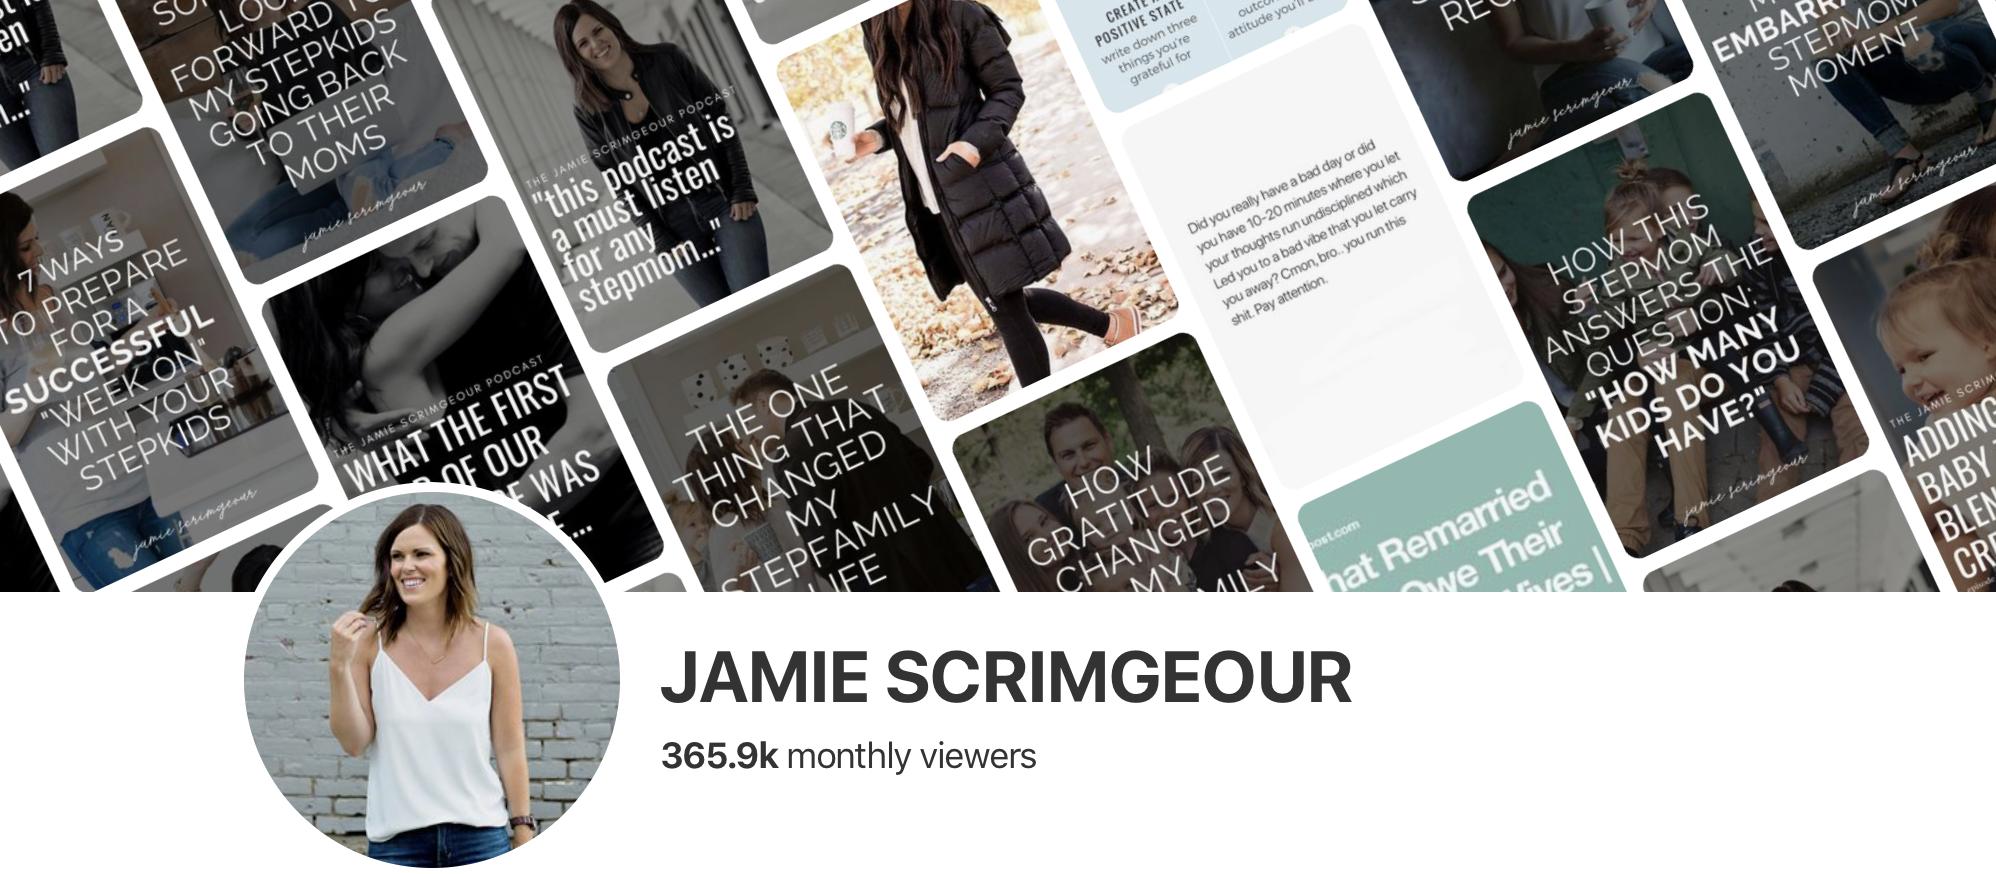 Jamie Scrimgeour - Come follow along on Pinterest - Stepmoms on Pinterest